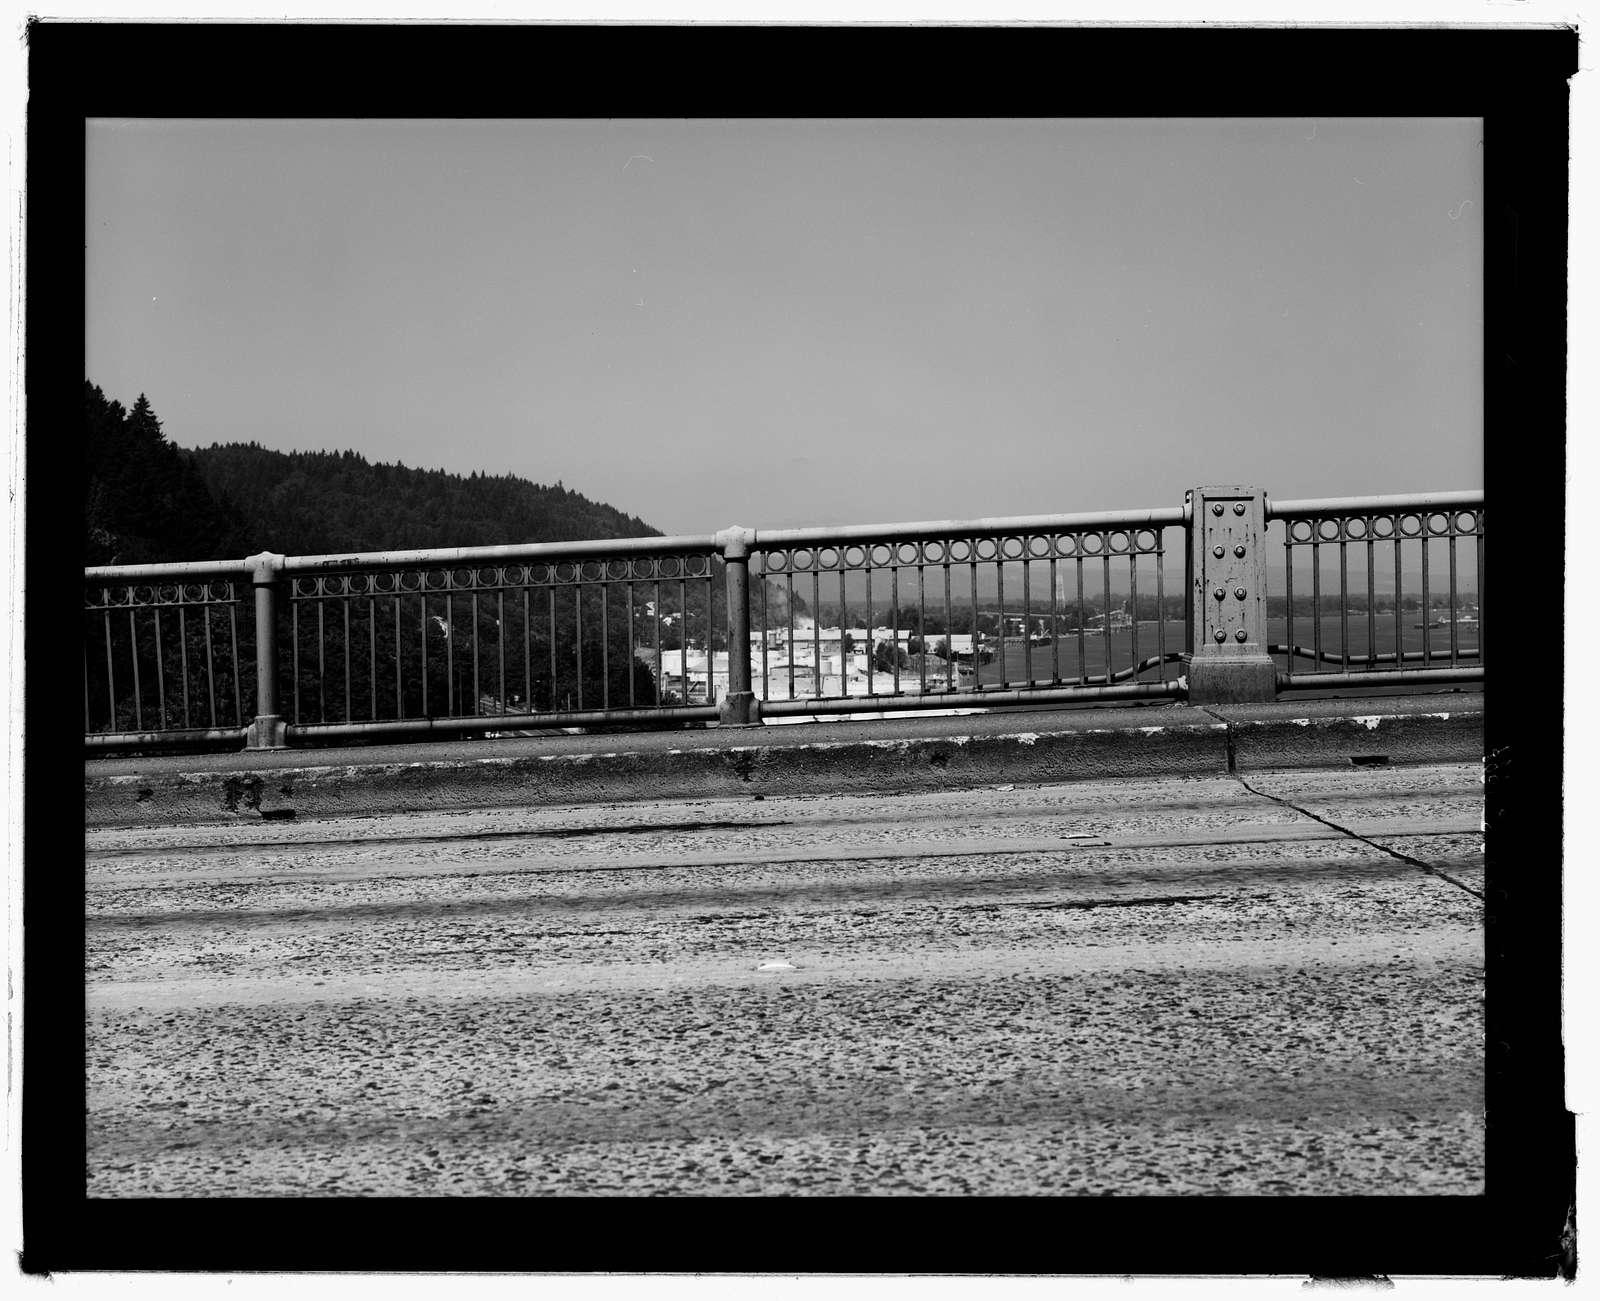 St. John's Bridge, Spans Willamette River at US Highway 30, Portland, Multnomah County, OR